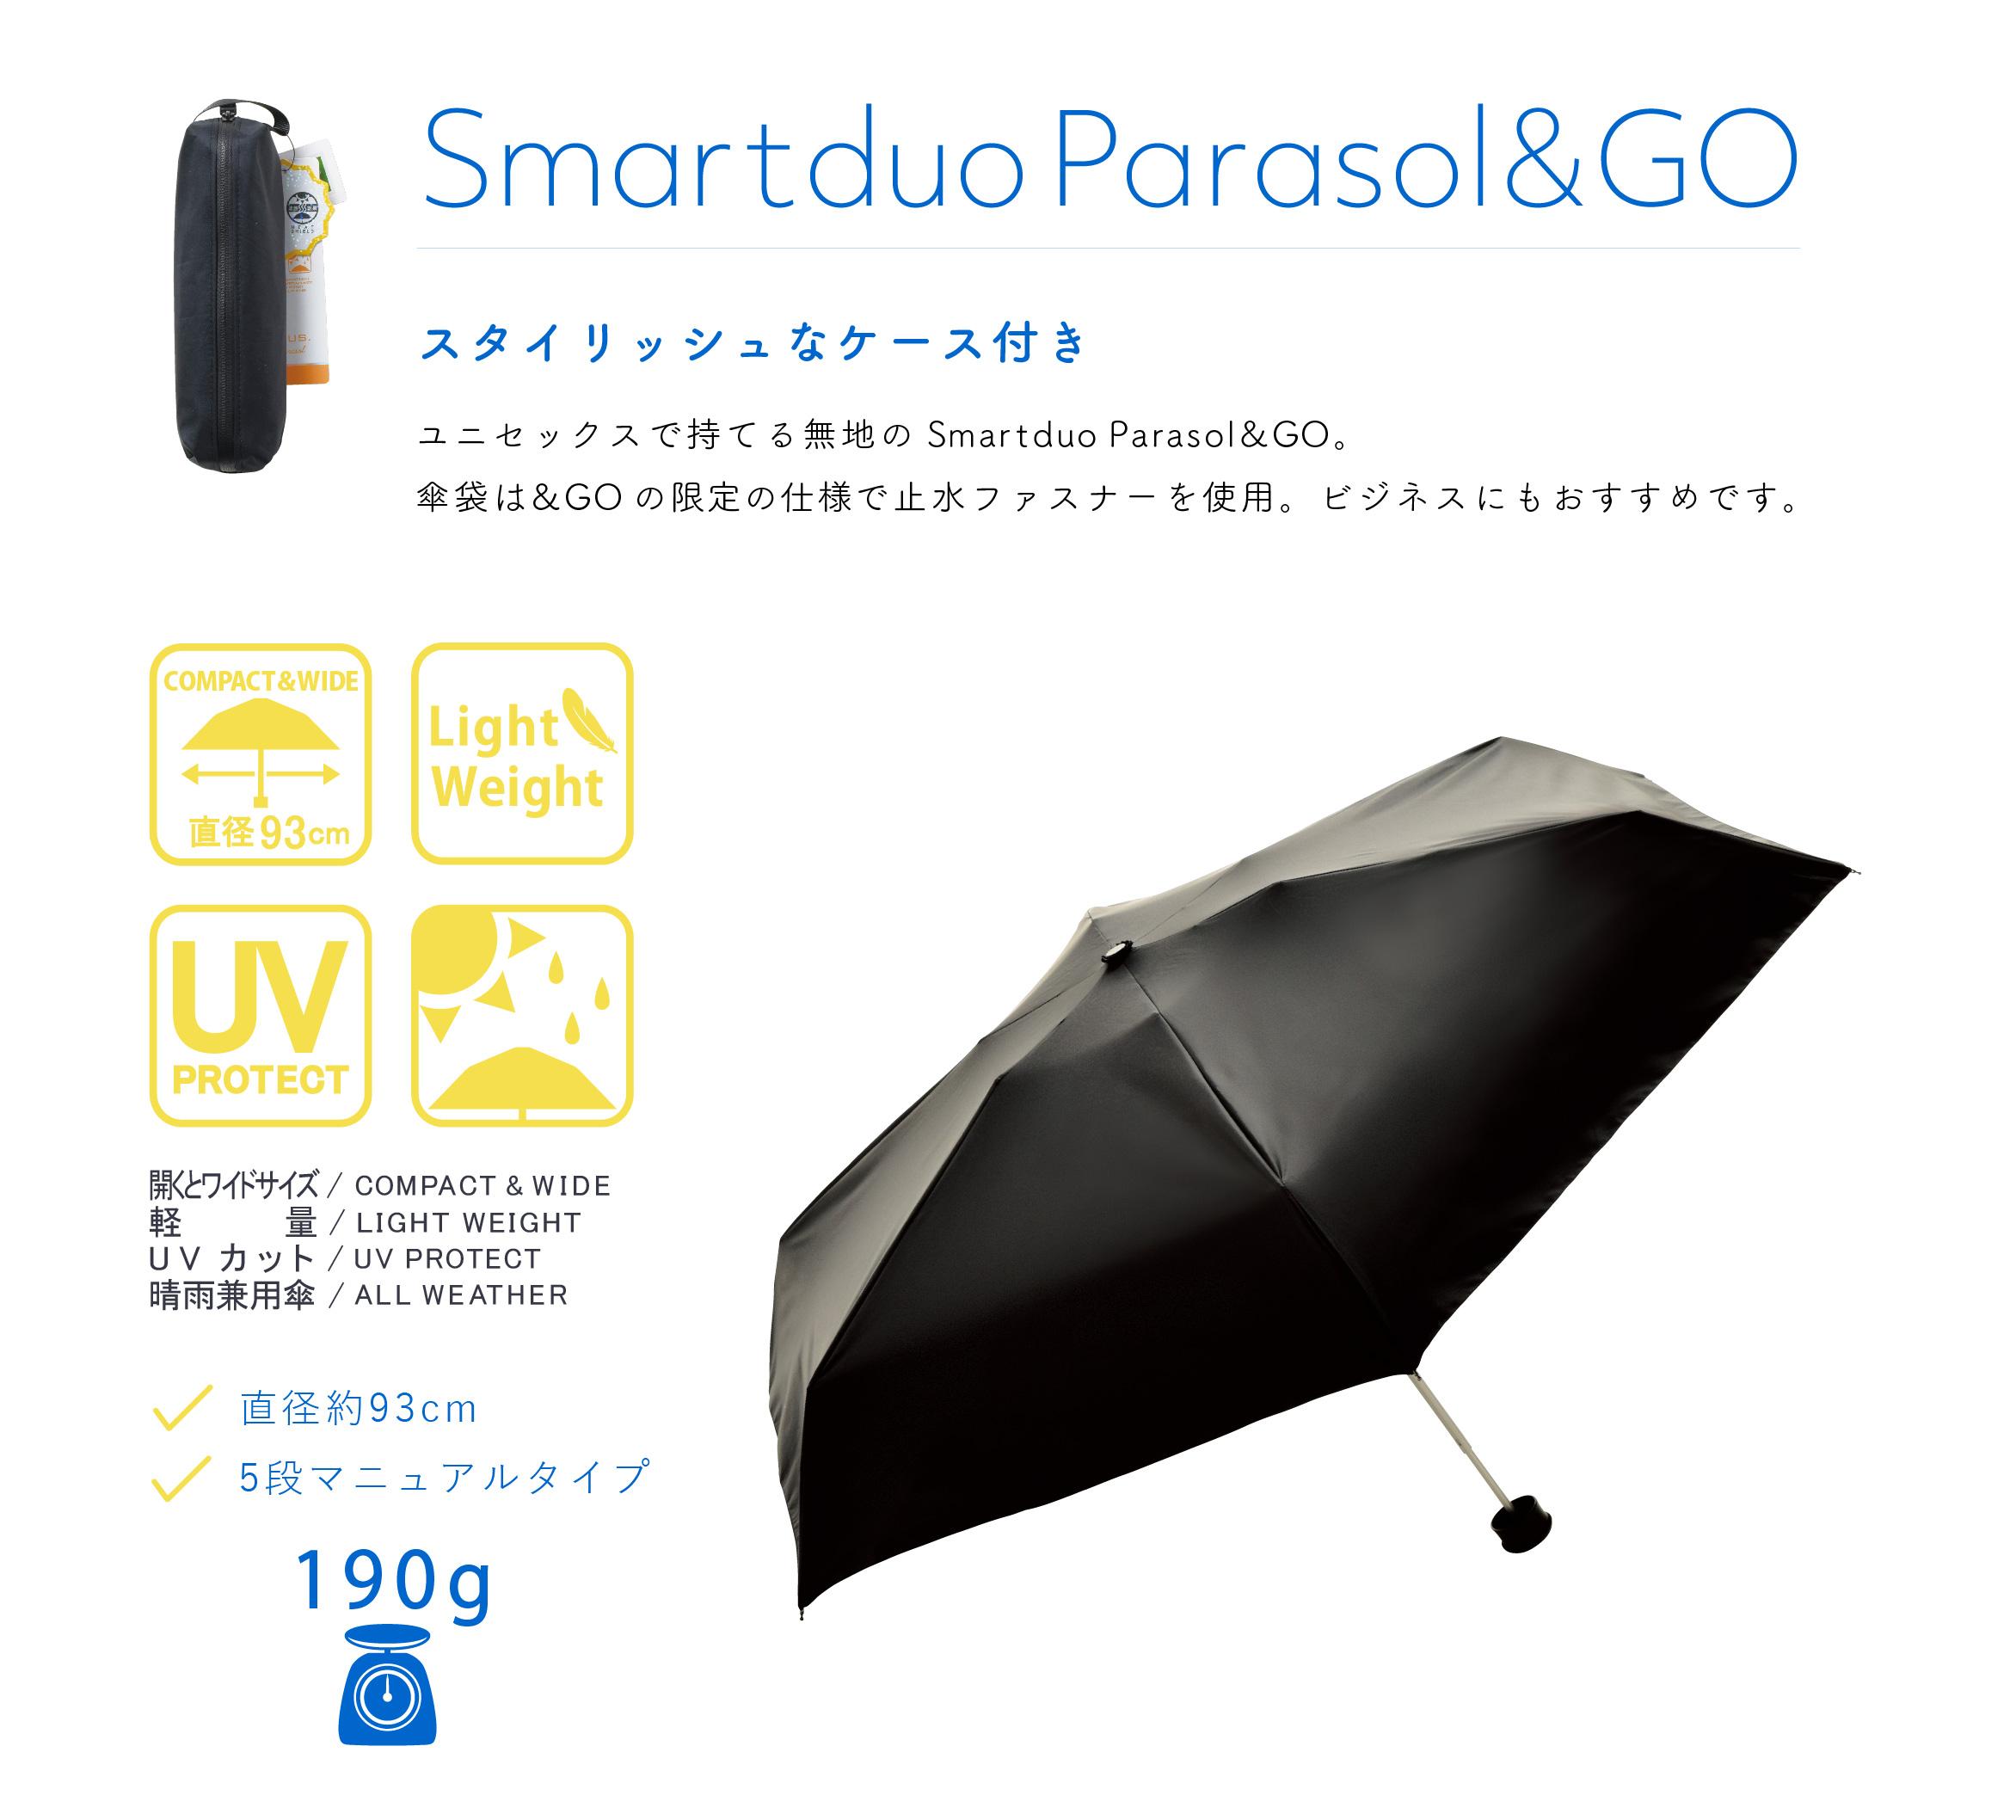 SmartduoParasolGO